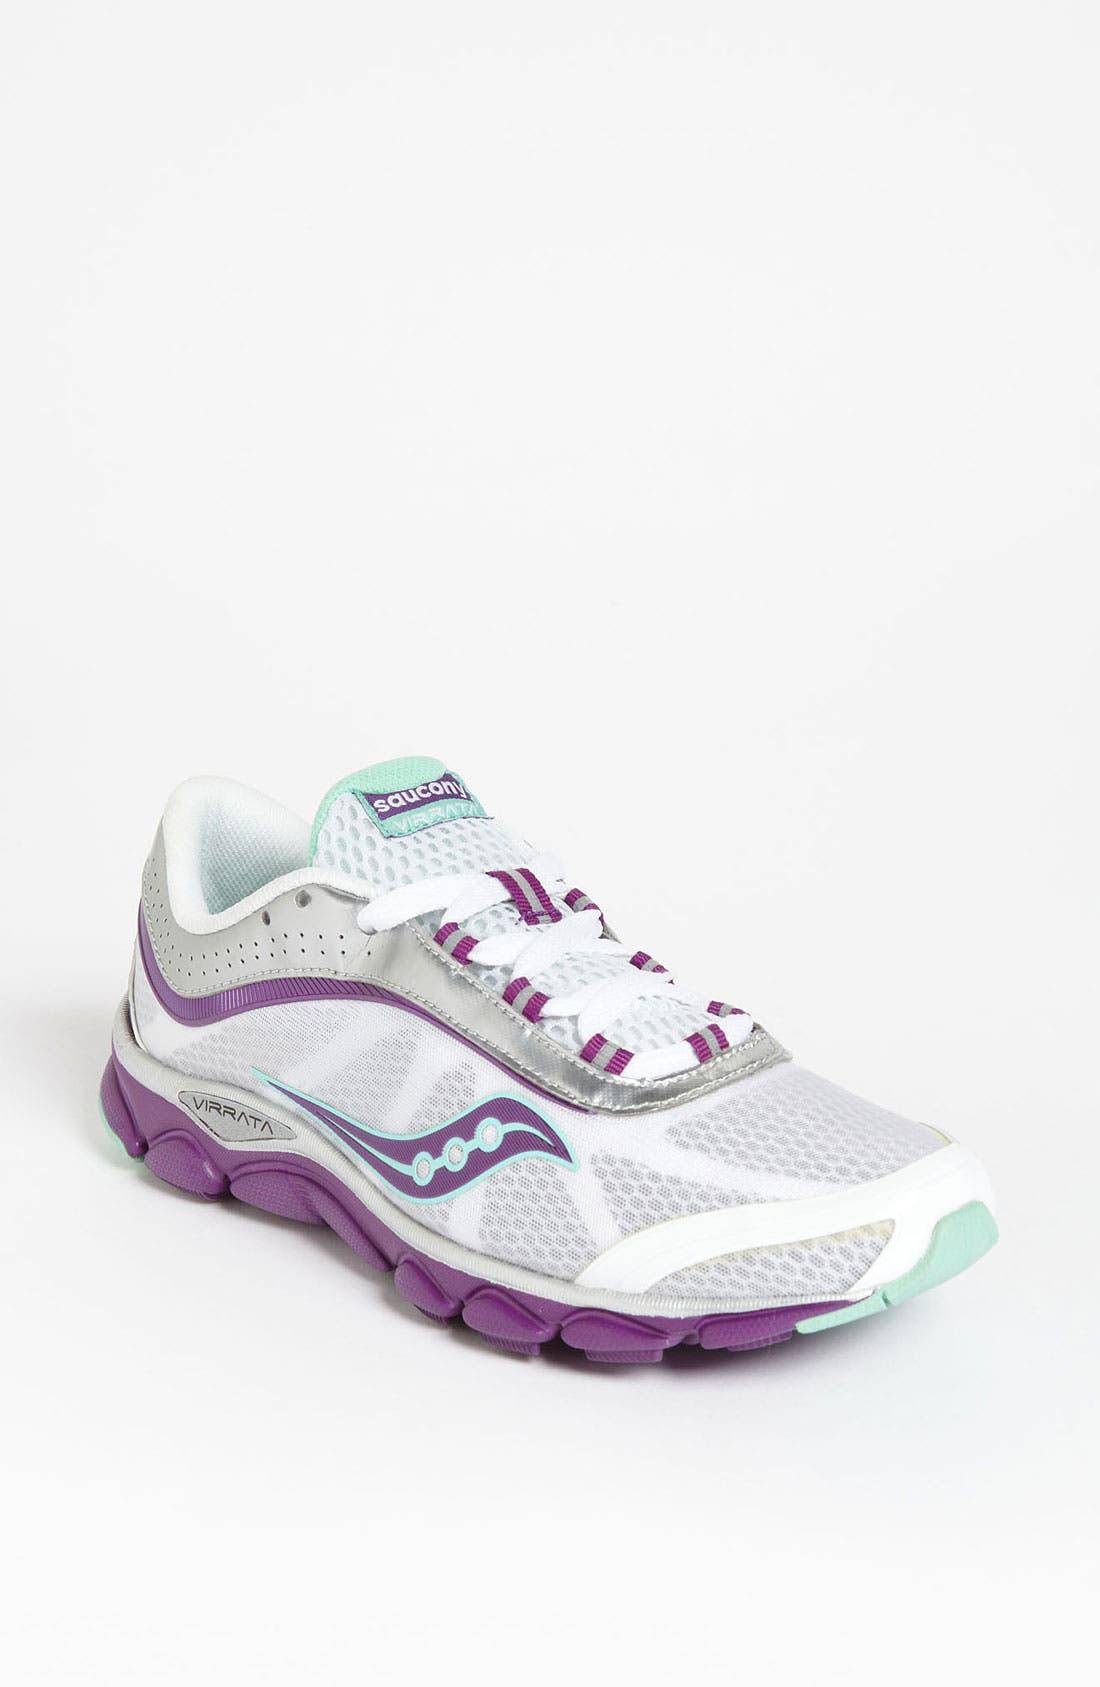 Alternate Image 1 Selected - Saucony 'Virrata' Running Shoe (Women)(Regular Retail Price: $89.95)